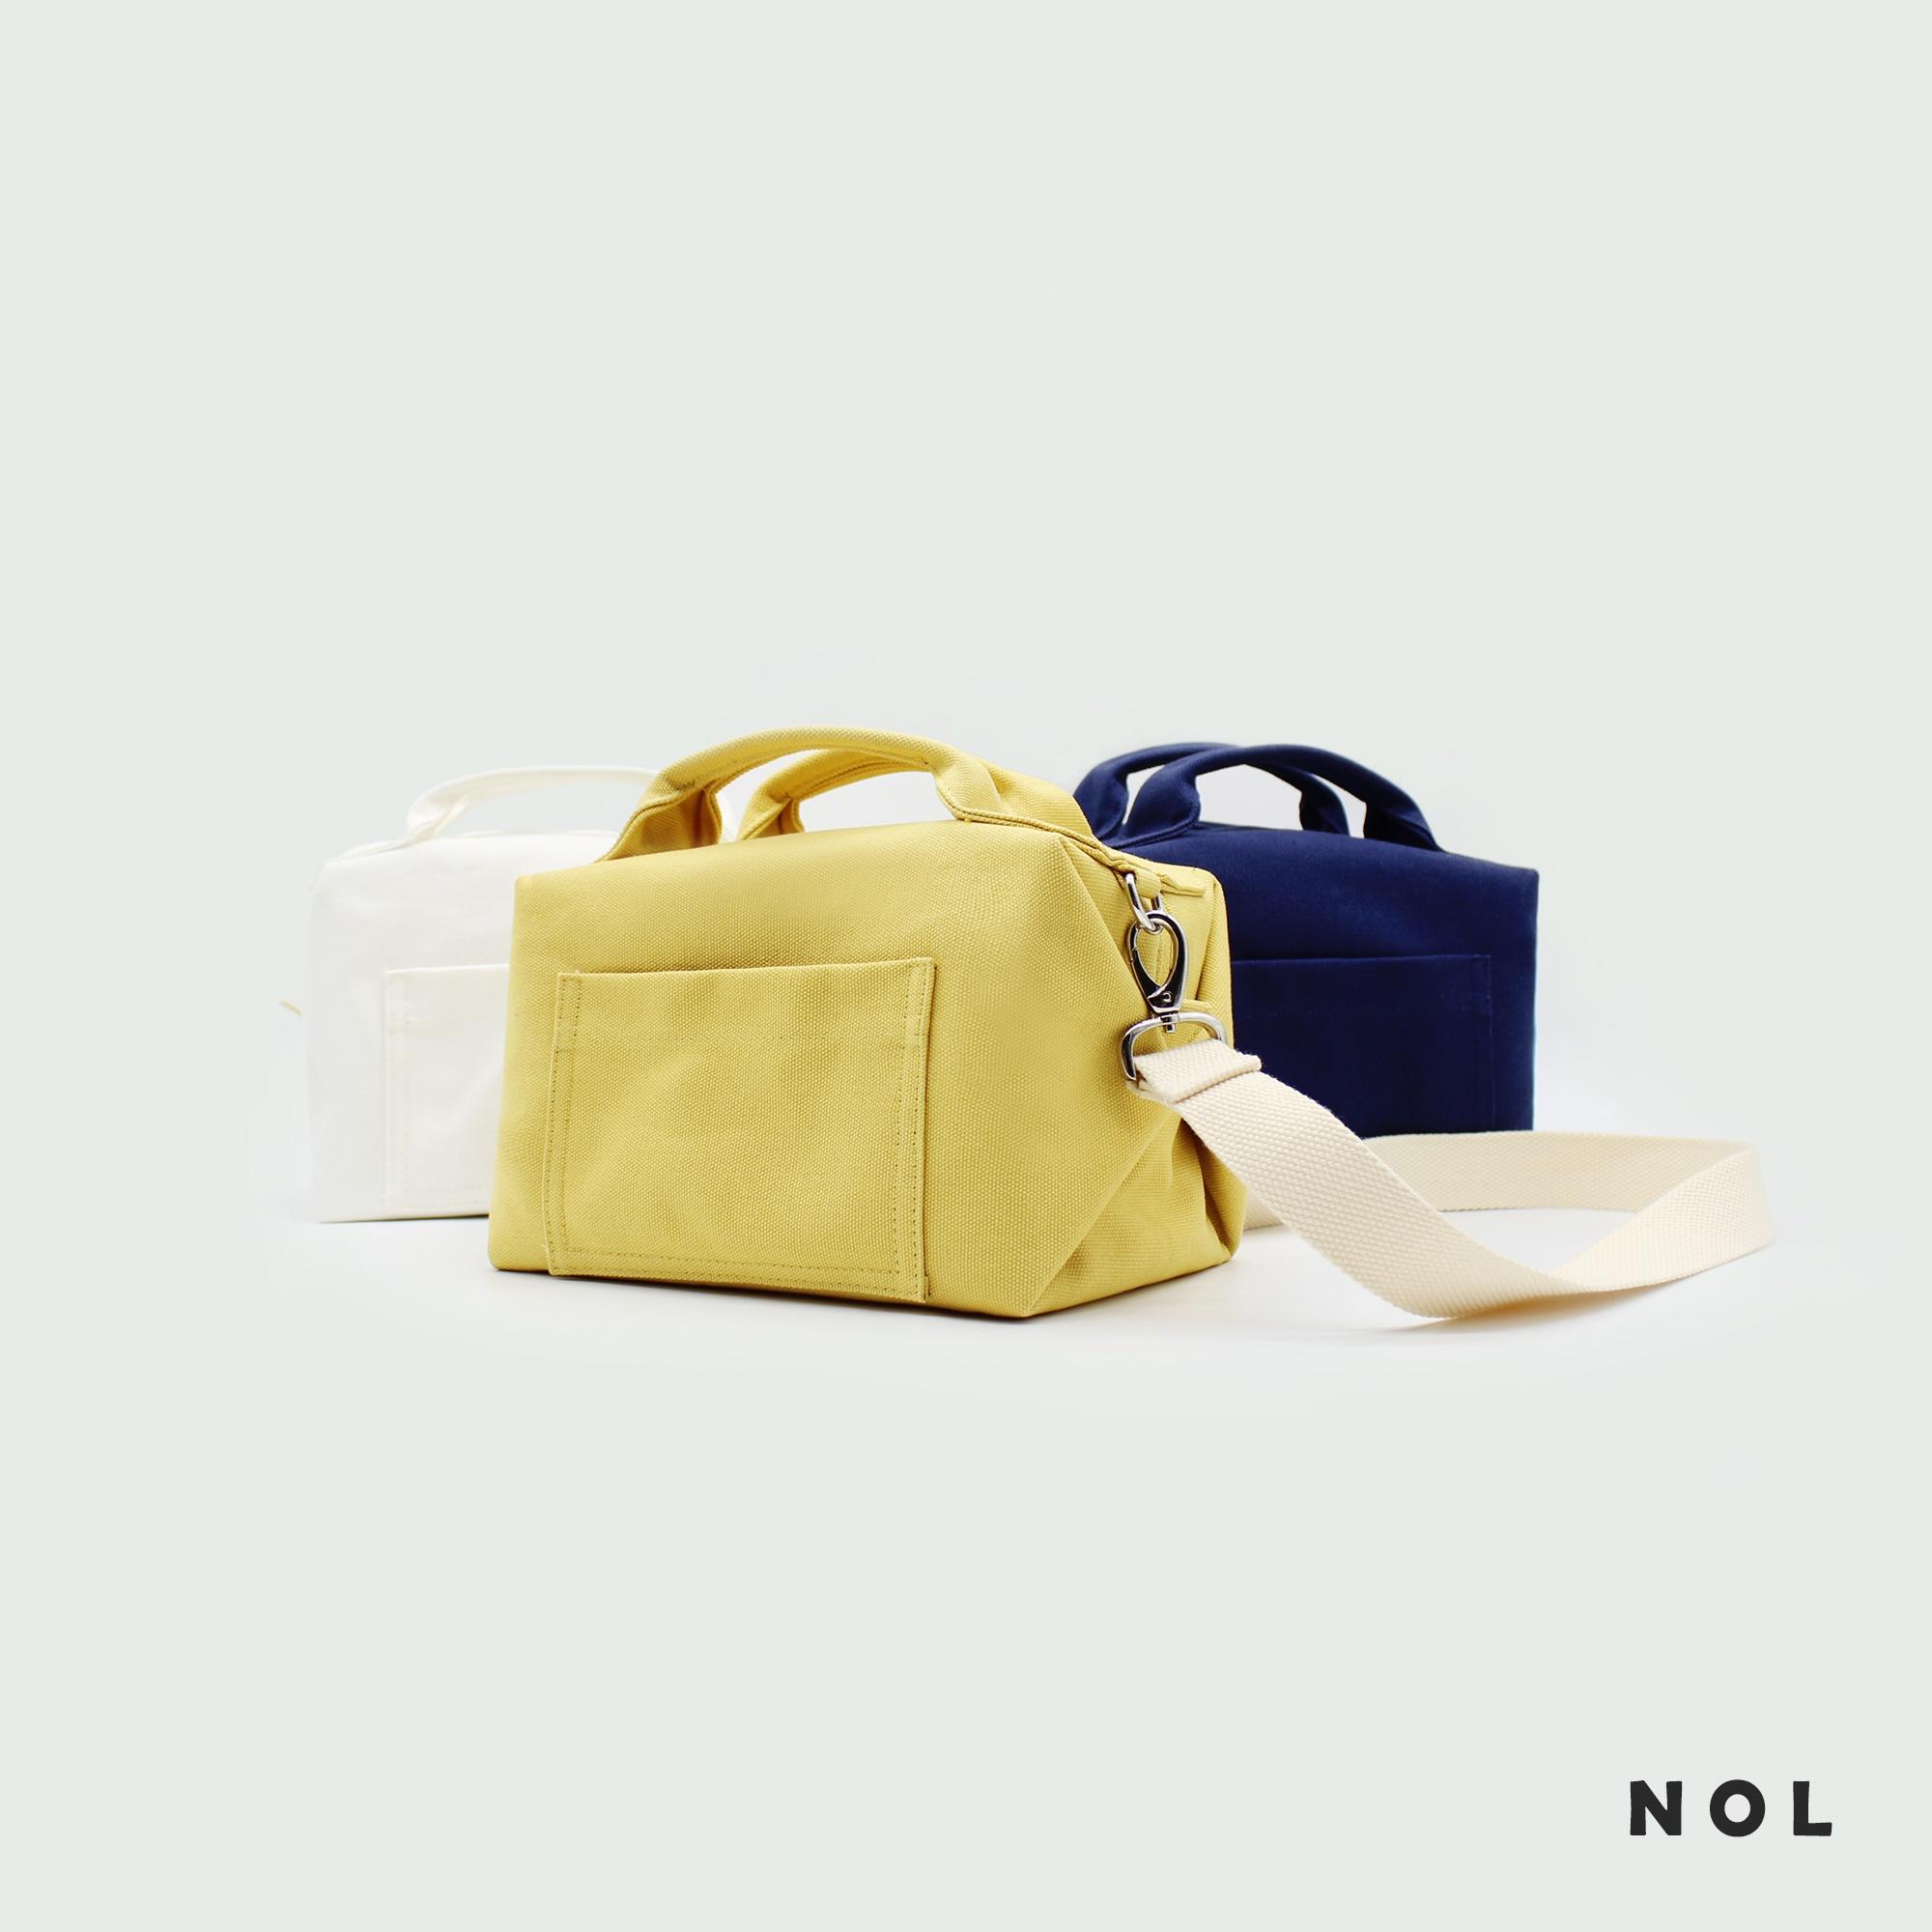 NOL环保帆布防水保温内里便当袋午餐便当饭盒袋手提拎包